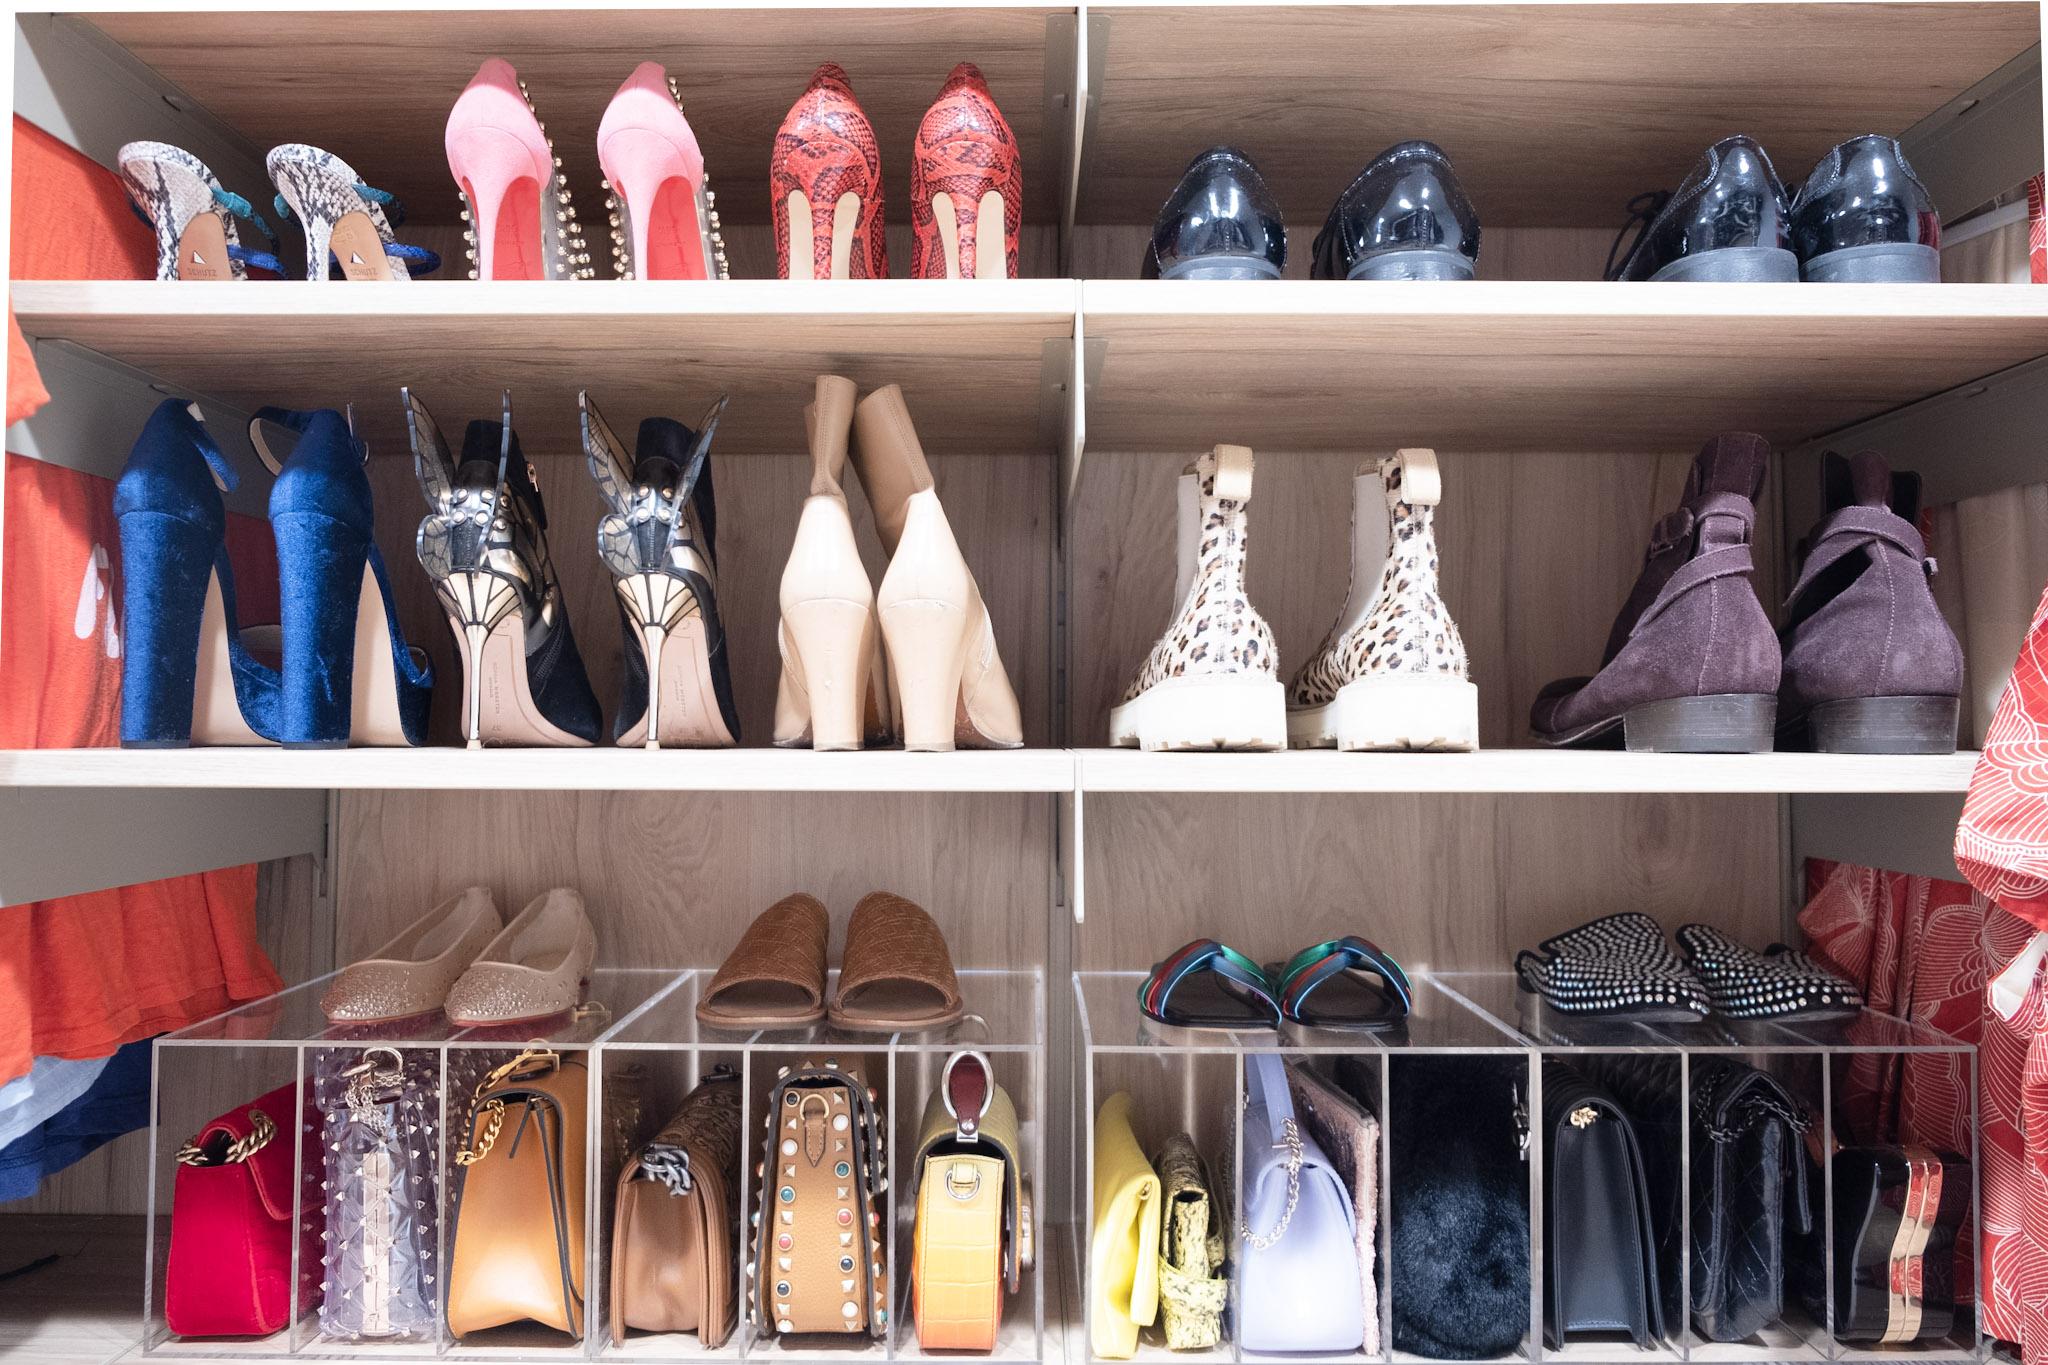 4 idei organizacii primenennye v garderobe kejsi masgrejvs